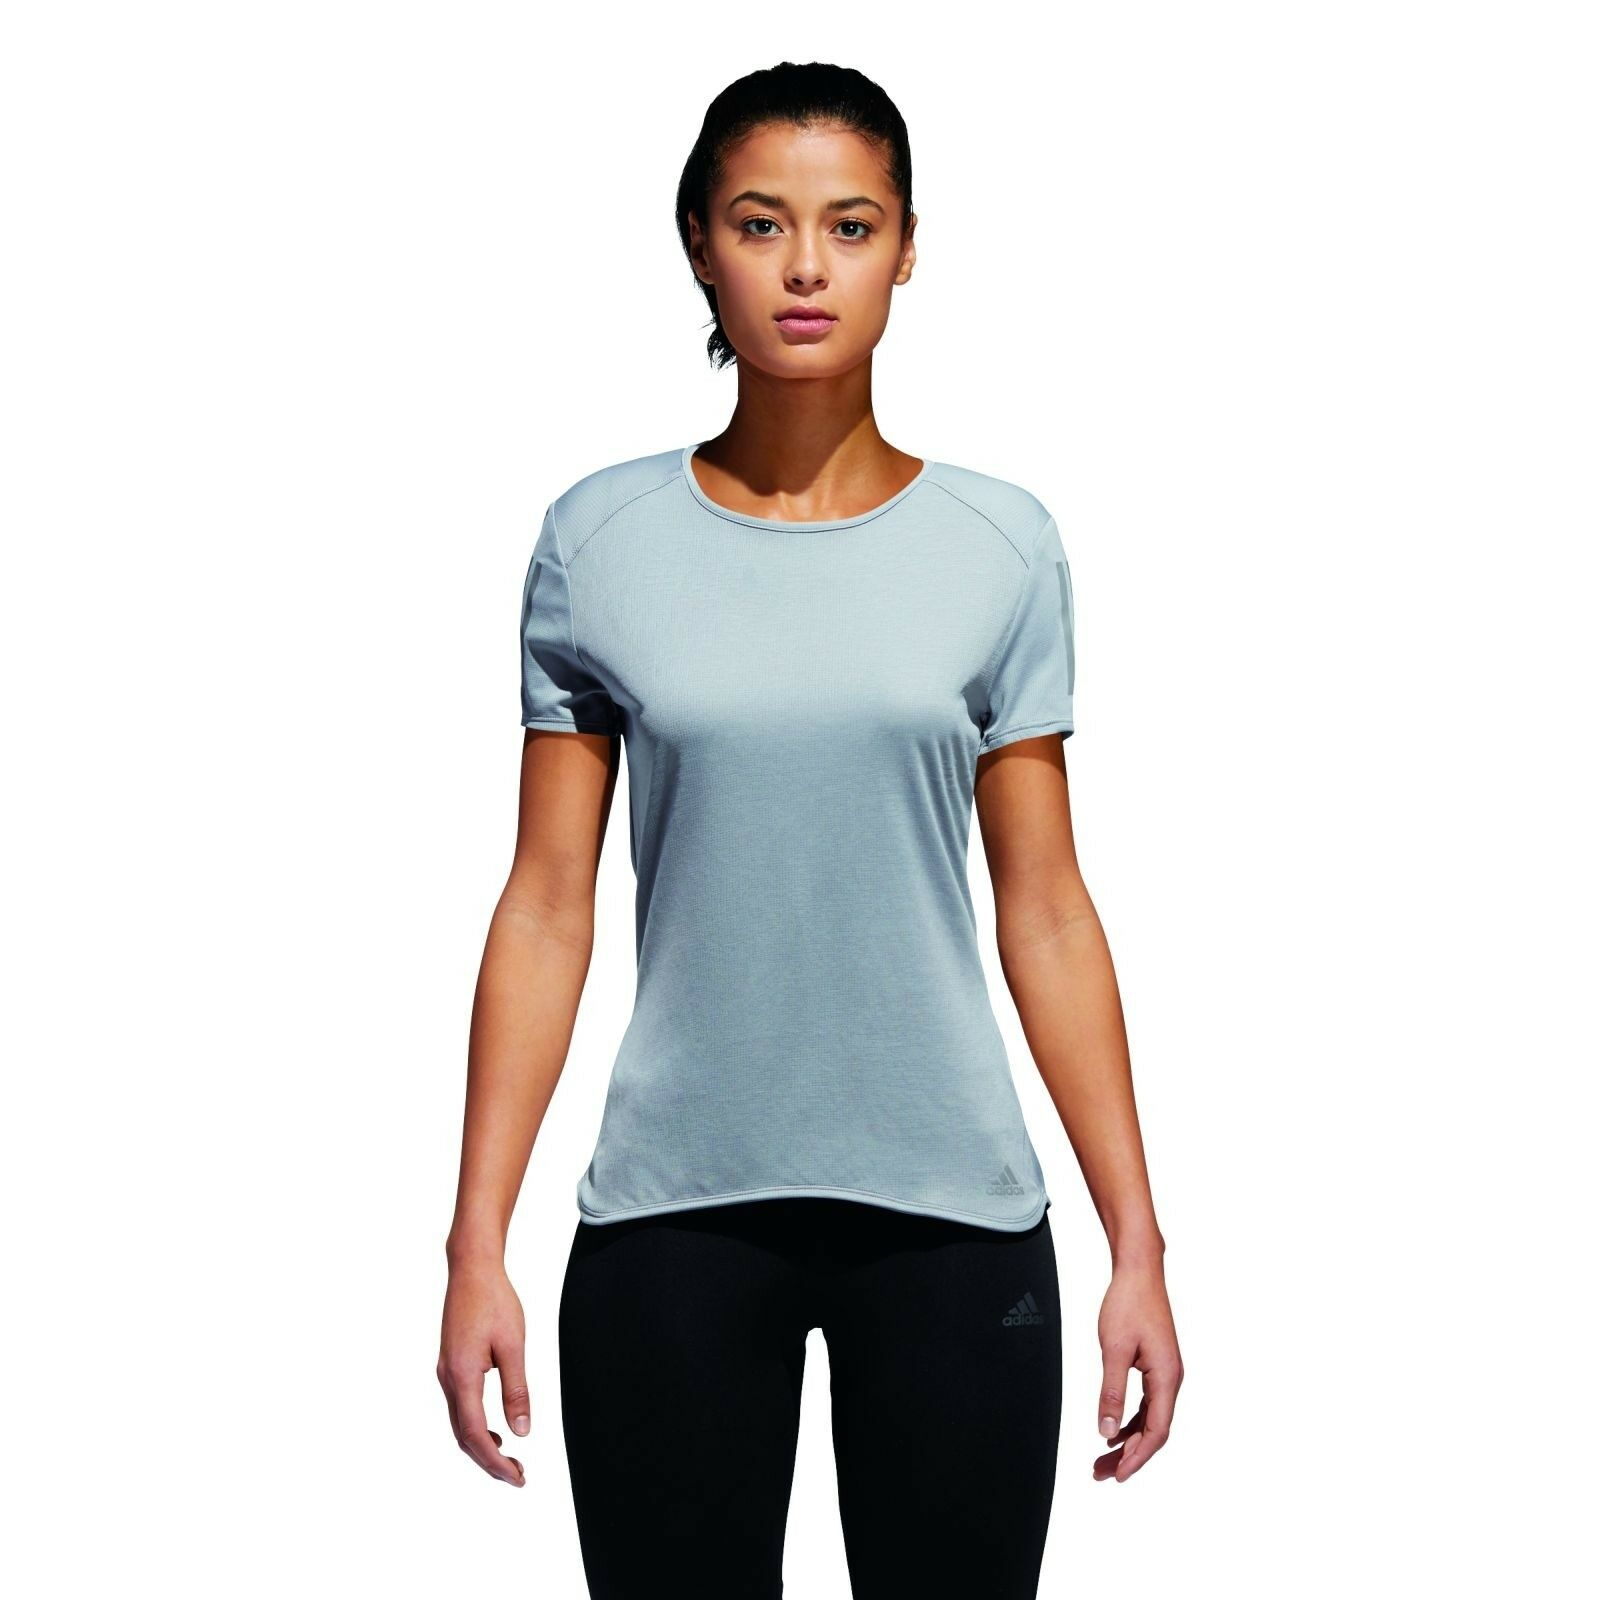 90e56e8f6abaa Adidas Performance Women's Running Shirt Response Sleeve T-Shirt w Grey  Short 3S oswron2794-Activewear Tops